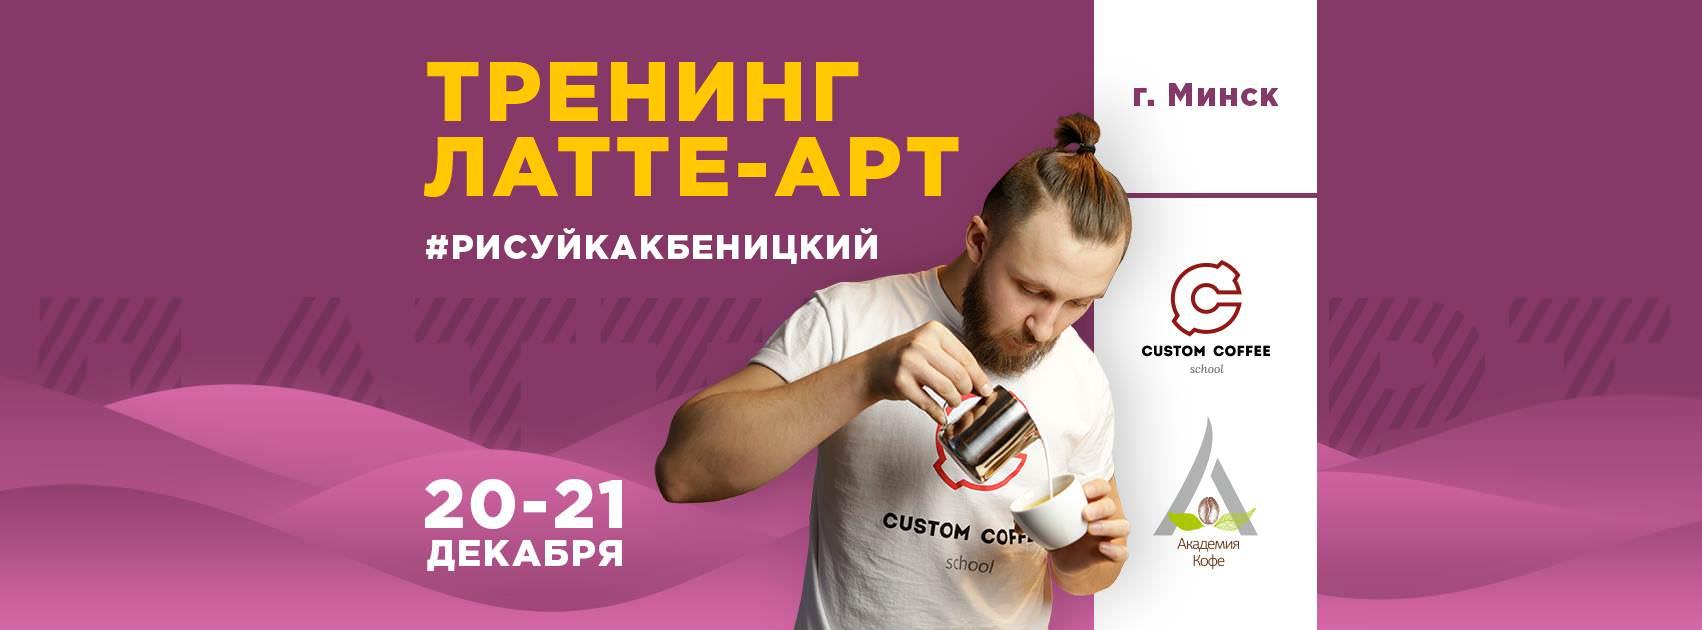 Александр Беницкий: латте арт тренинг от чемпиона Украины 2017